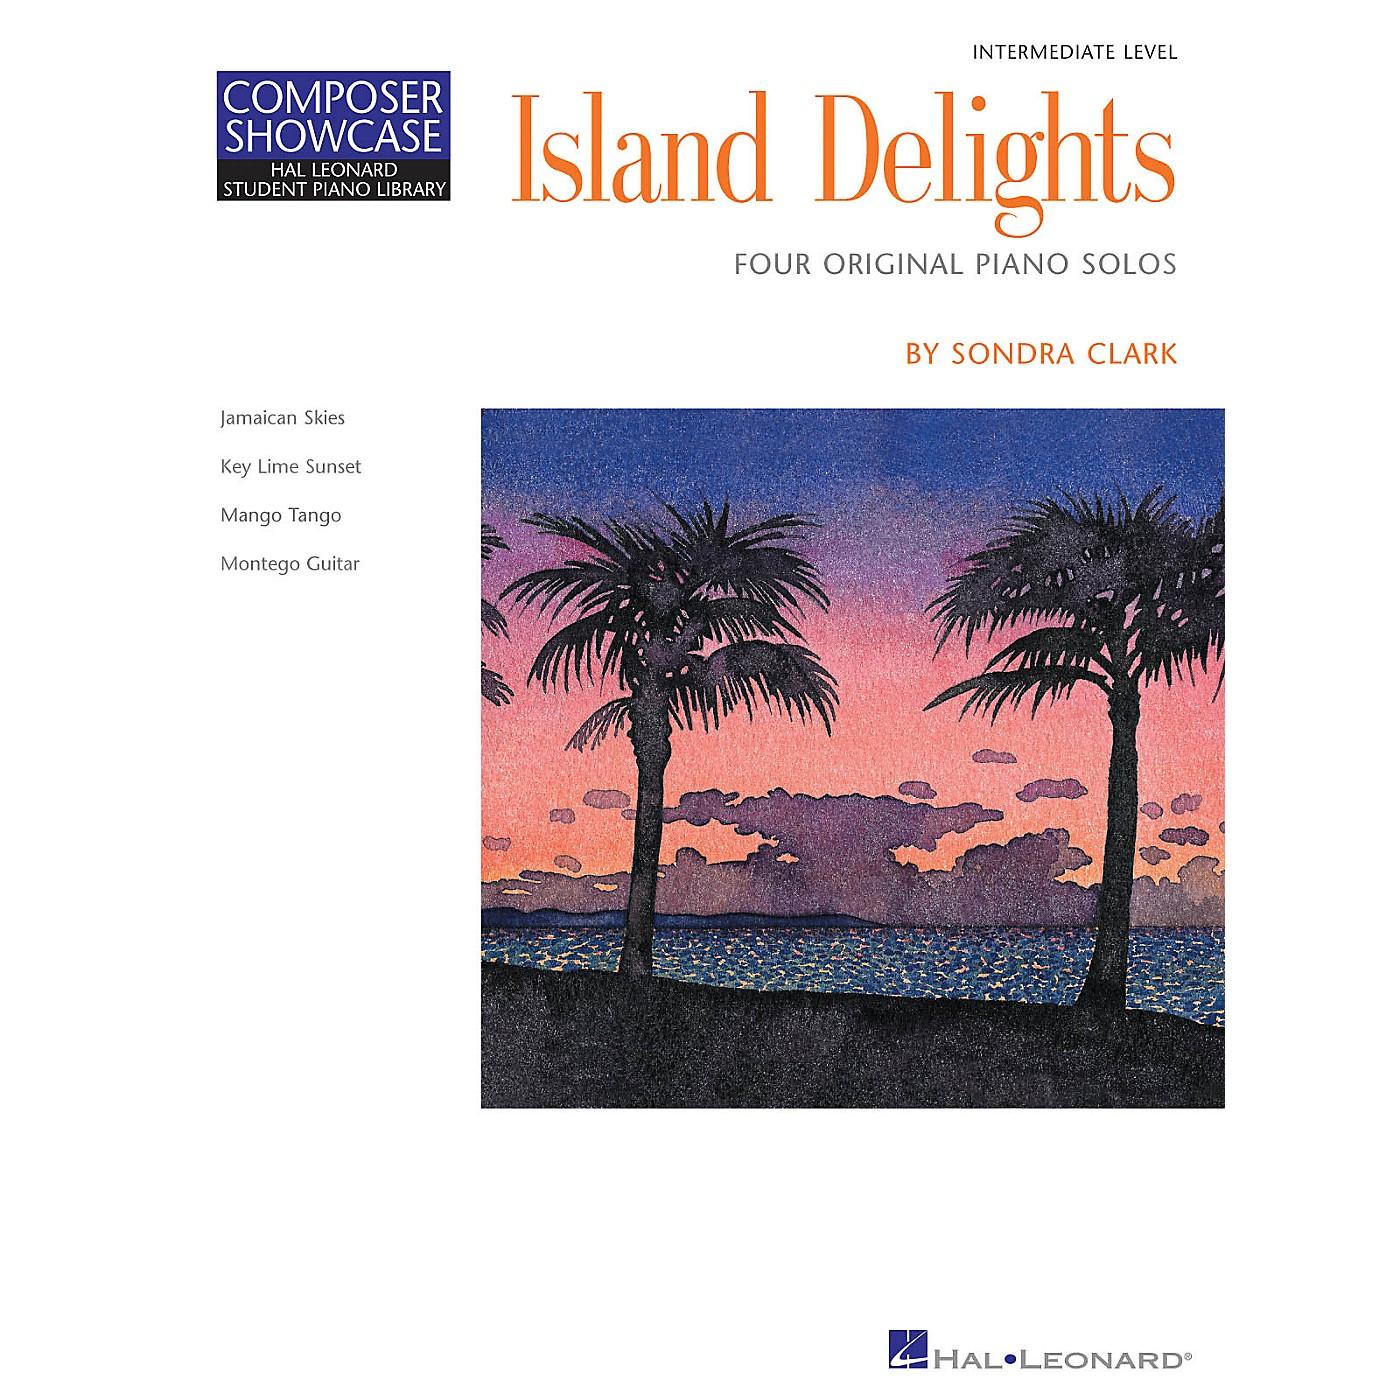 Hal Leonard Island Delights (Inter Level) Piano Library Series by Sondra Clark thumbnail